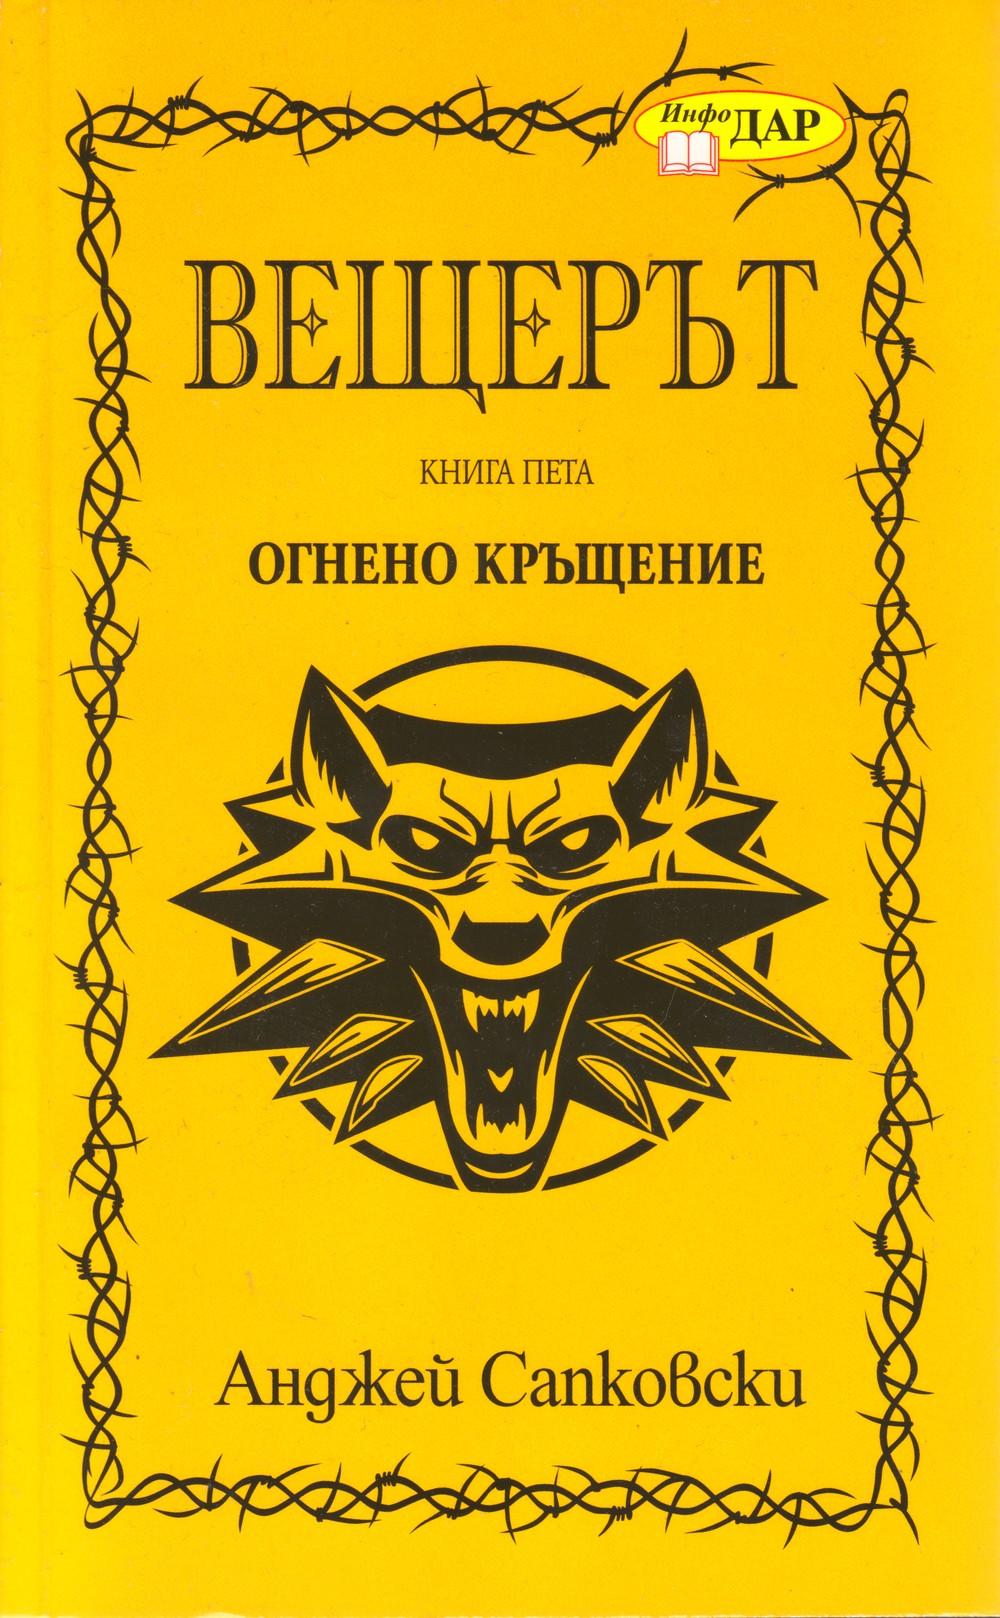 File:Veshteryt-ogneno-kryshtenie.jpg